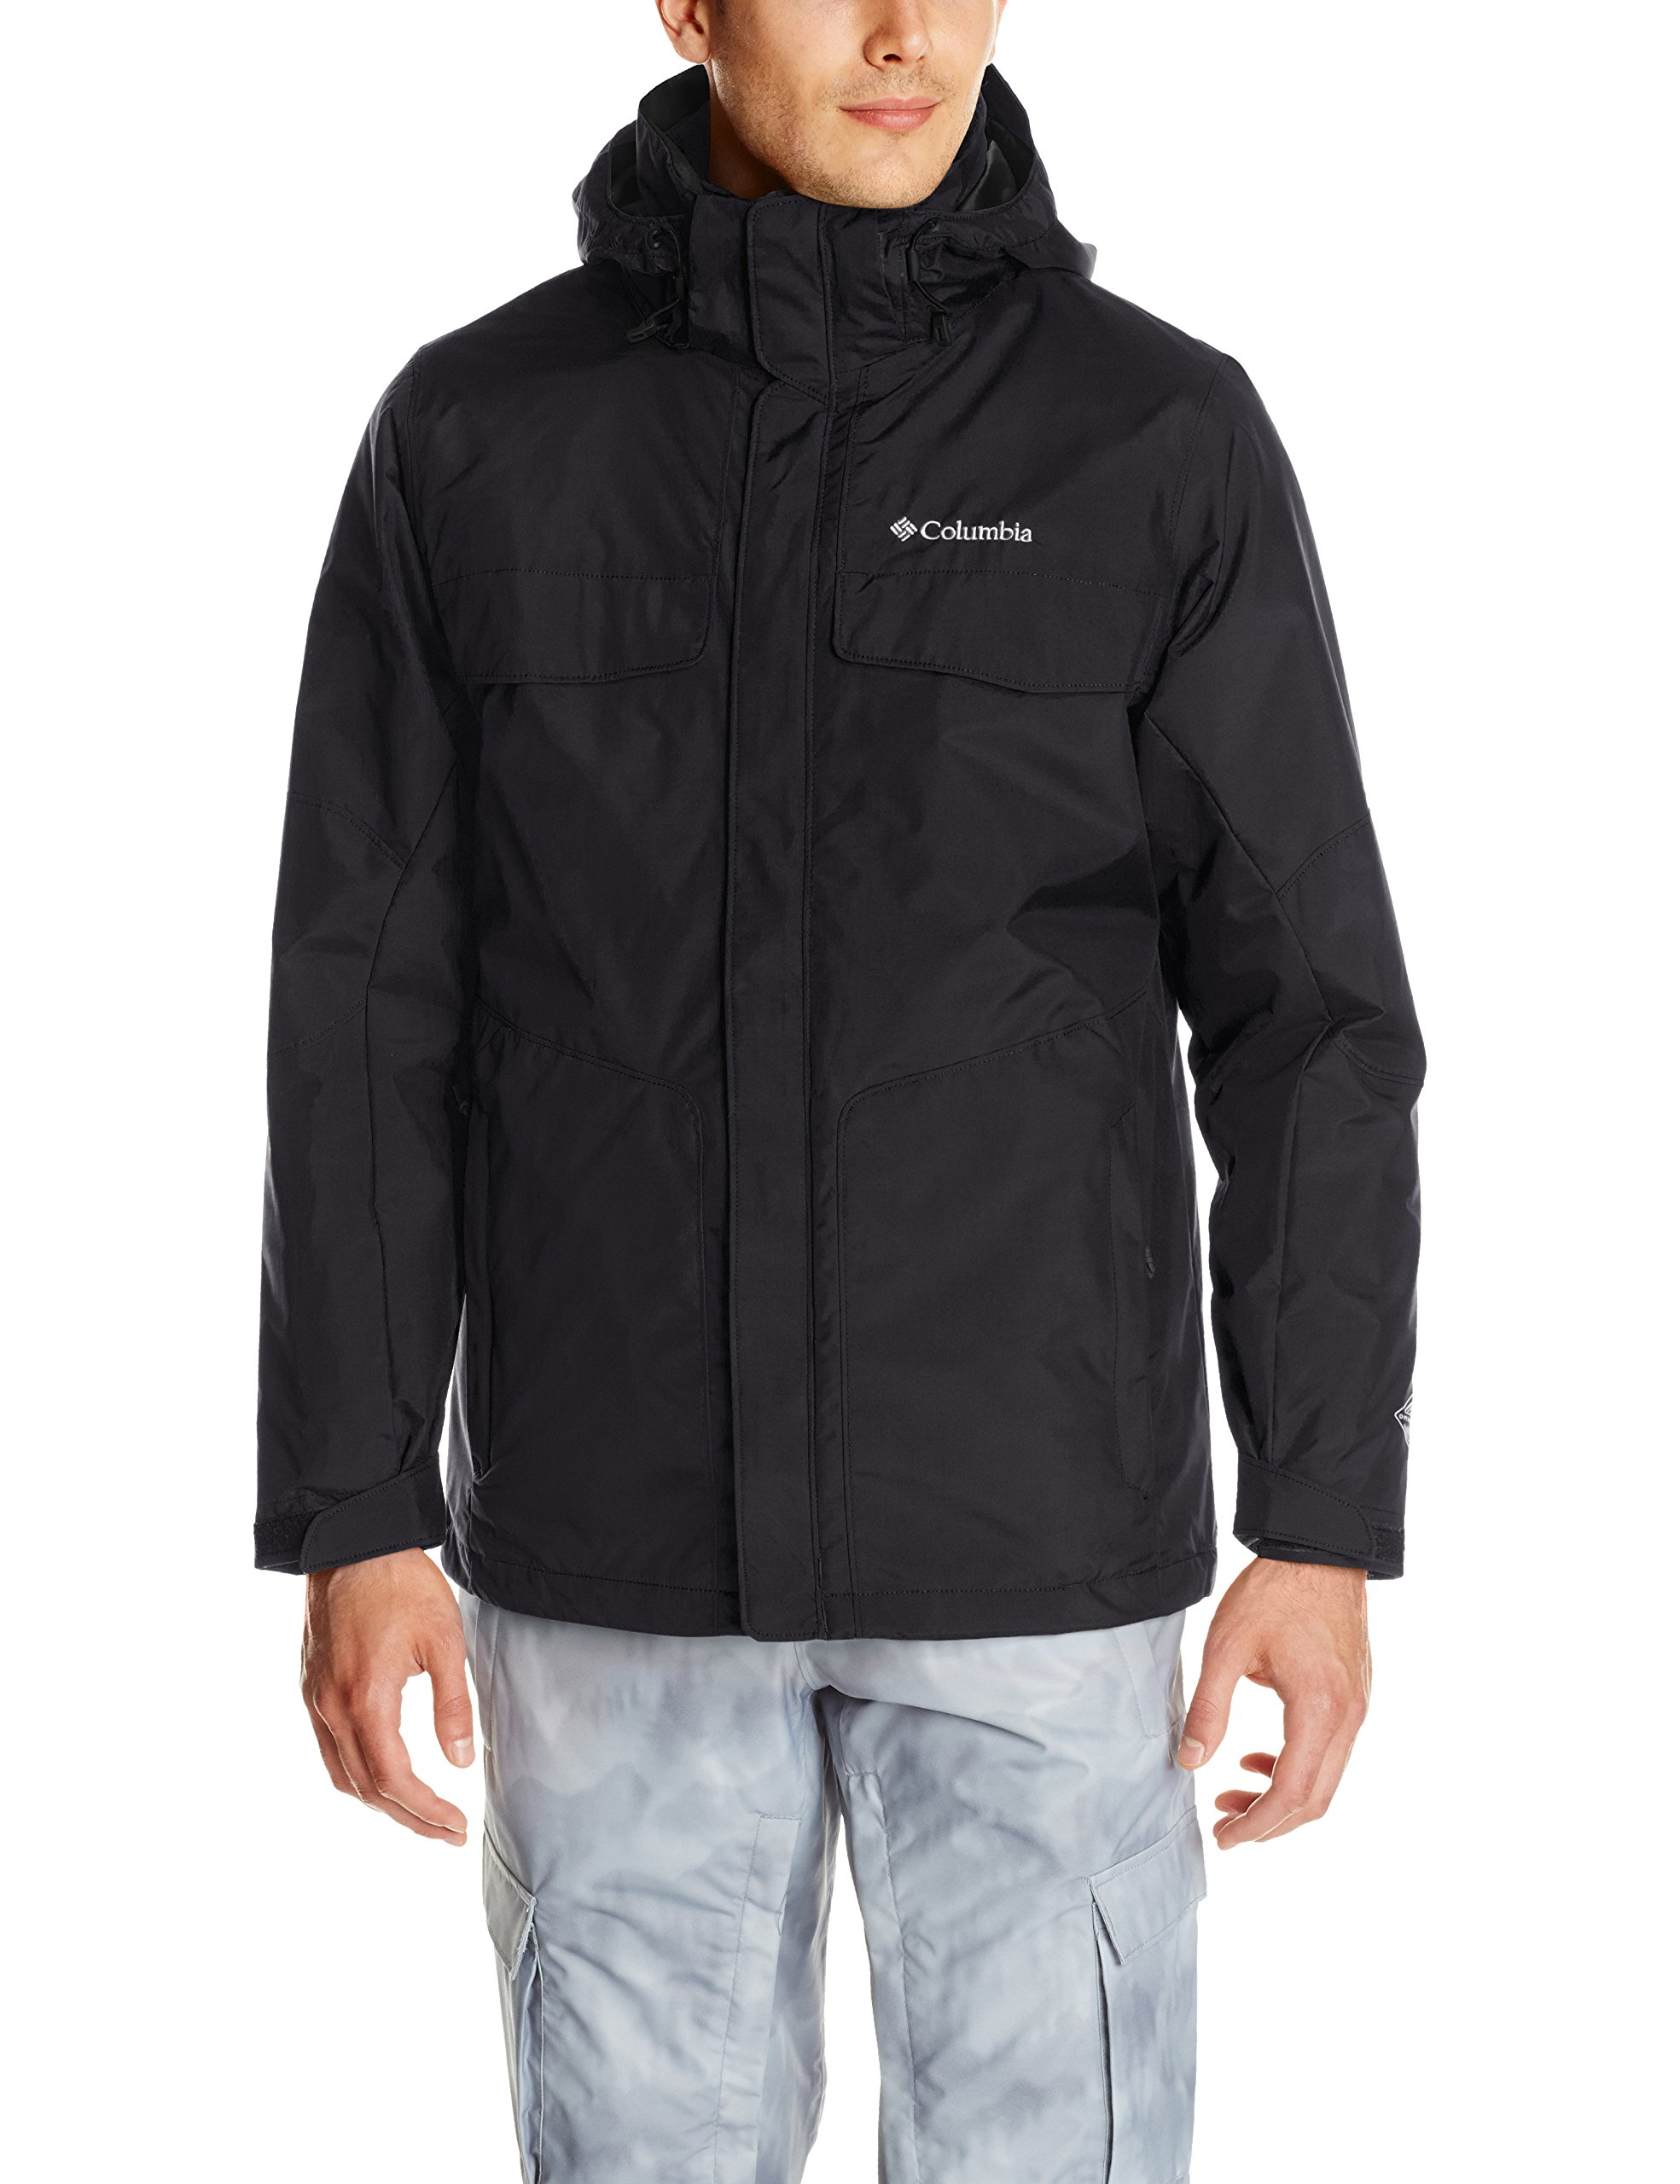 Columbia Men's Bugaboo Interchange Jacket, Black, Medium